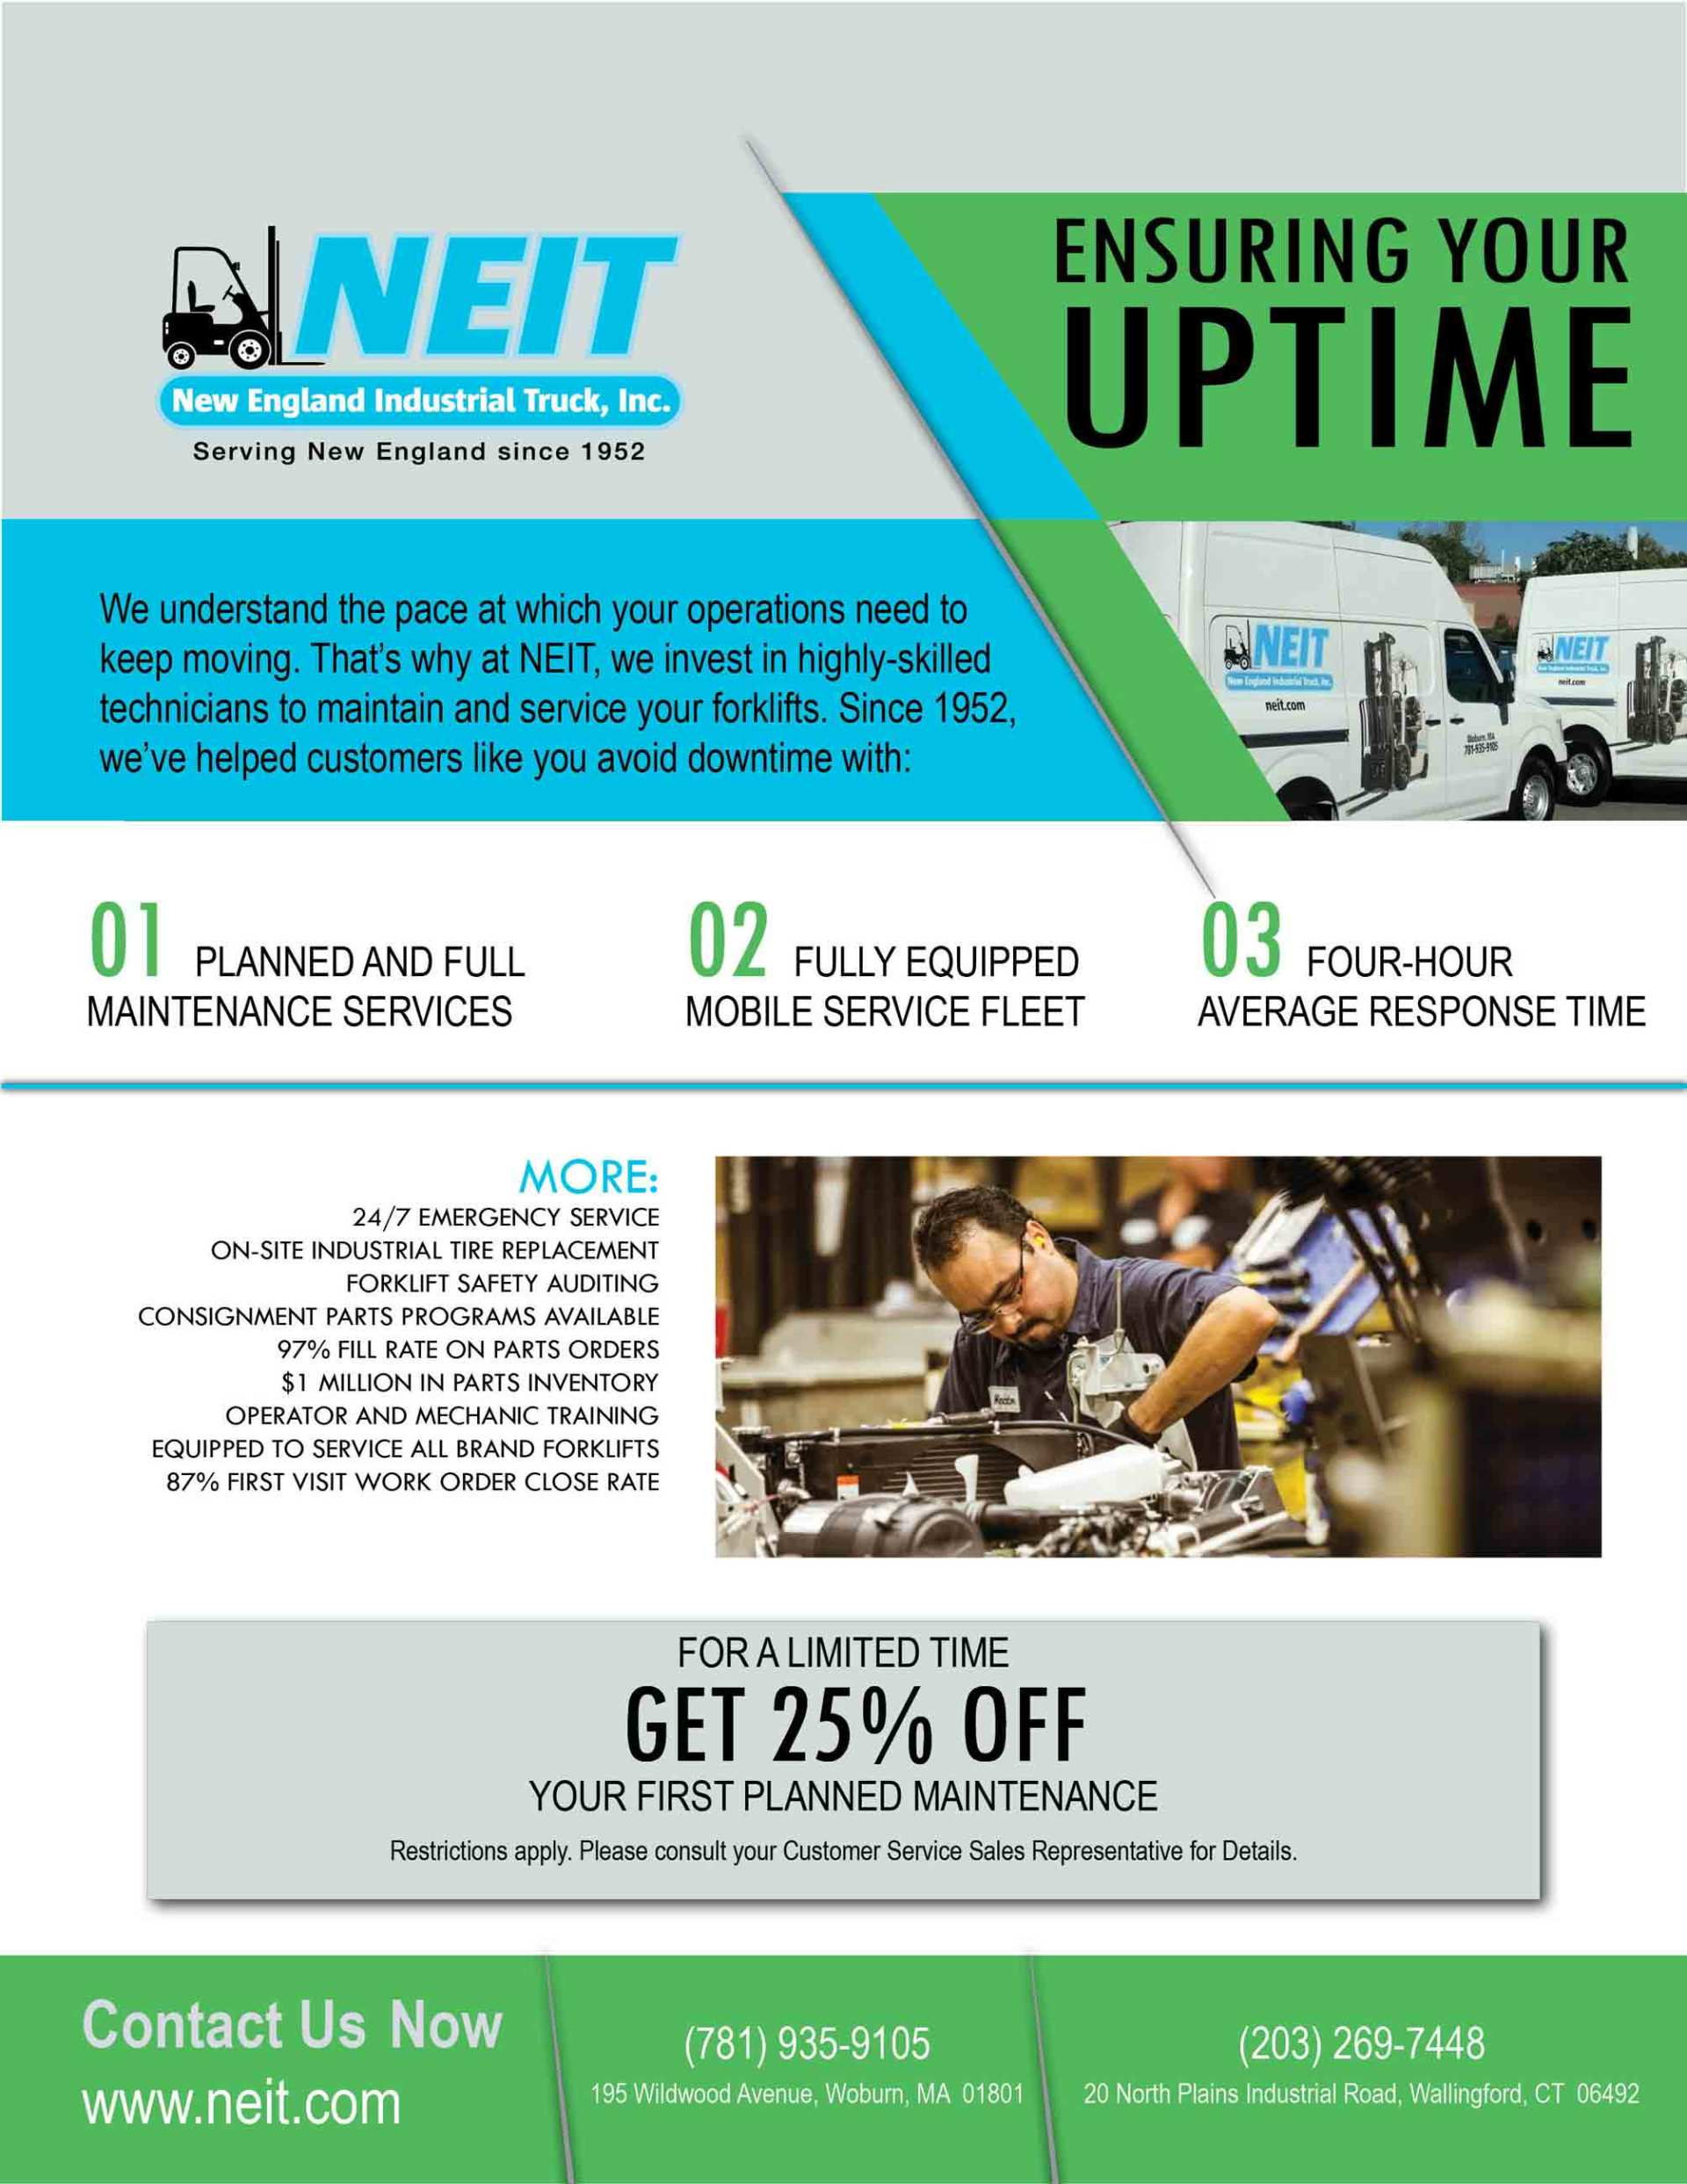 Forklift Service Designed To Ensure Your Uptime